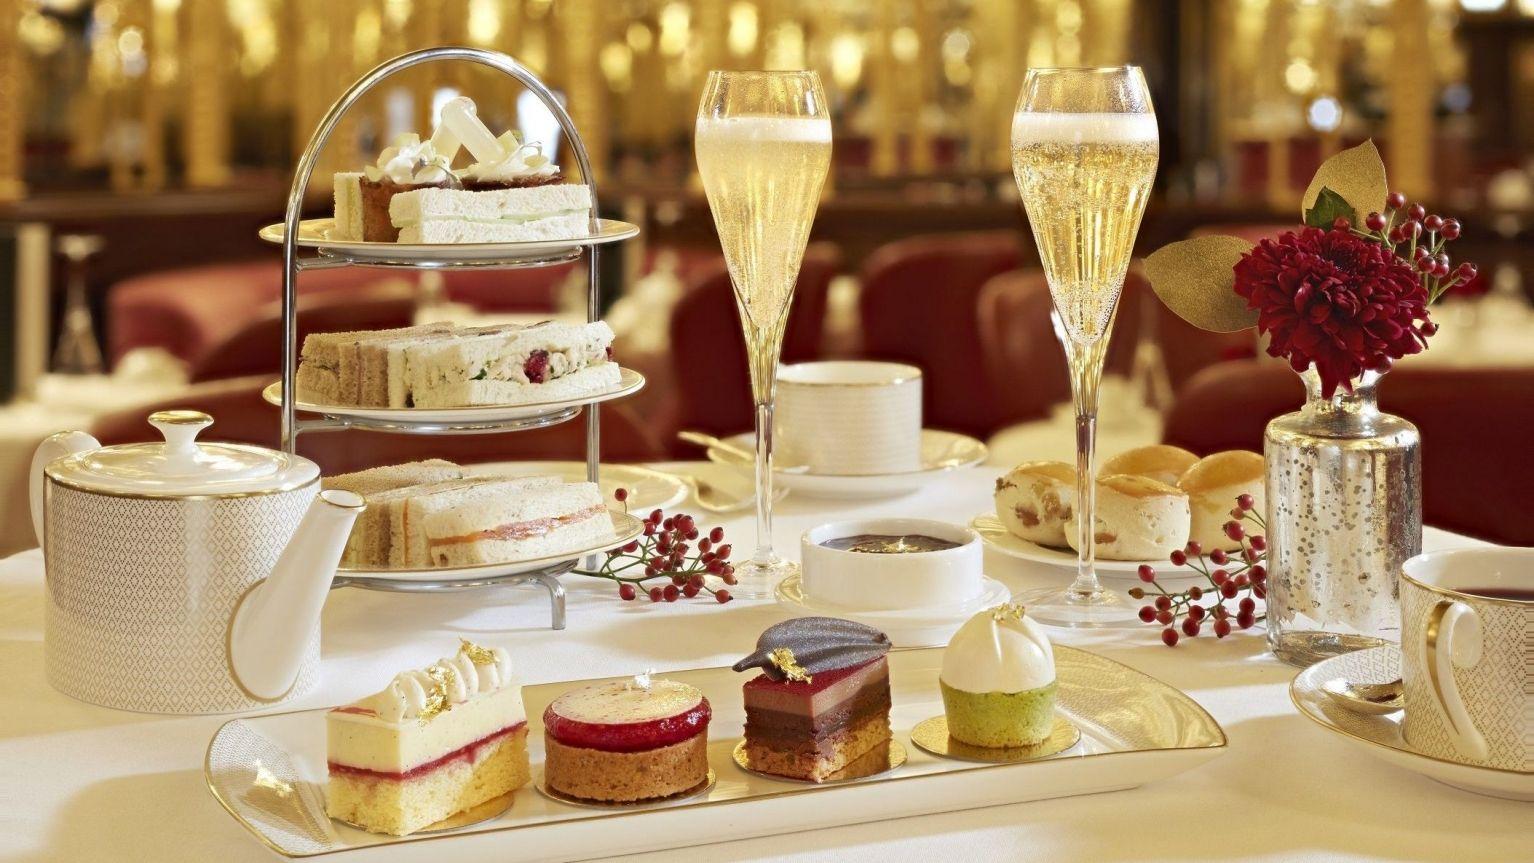 Cafe Royal Hotel Dessert Restaurant Replaced